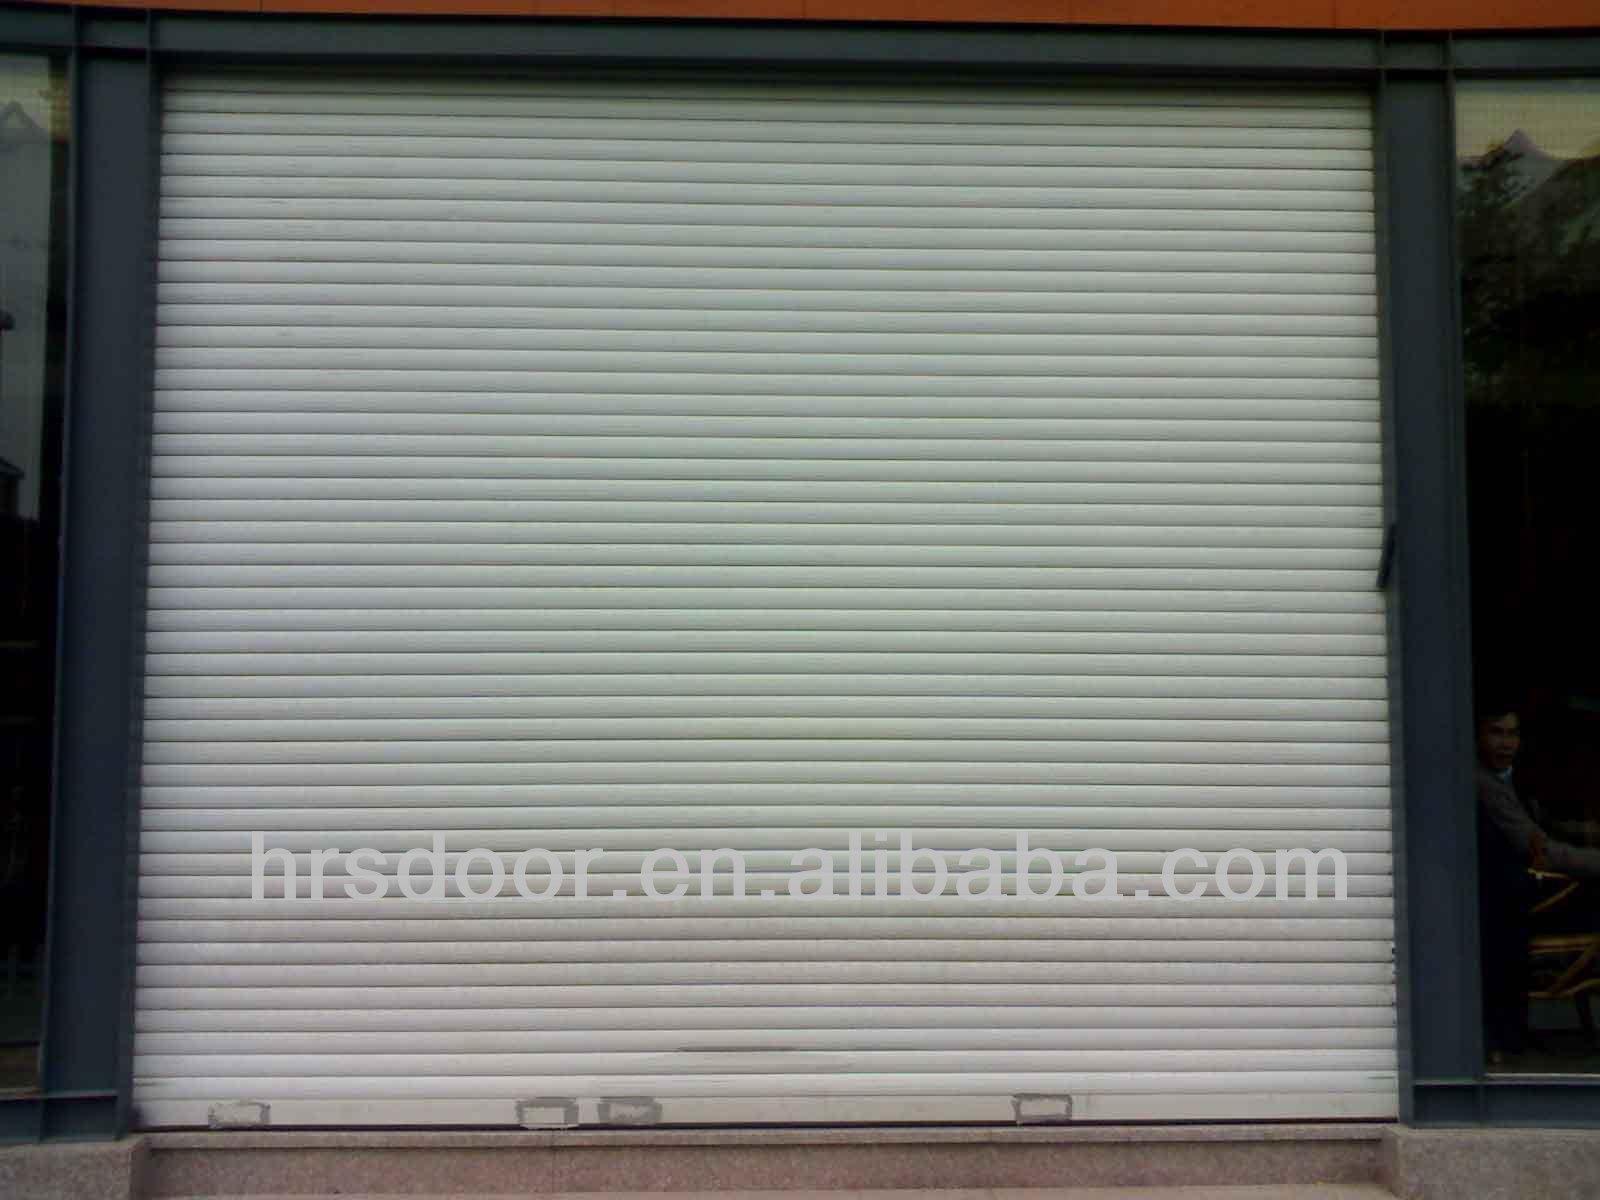 Roll up doors interior - 12004555194956161600 Com Aluminum Rolling Door Interior Roll Up Door Buy Interior Roll Up 6b3d26 Aluminum